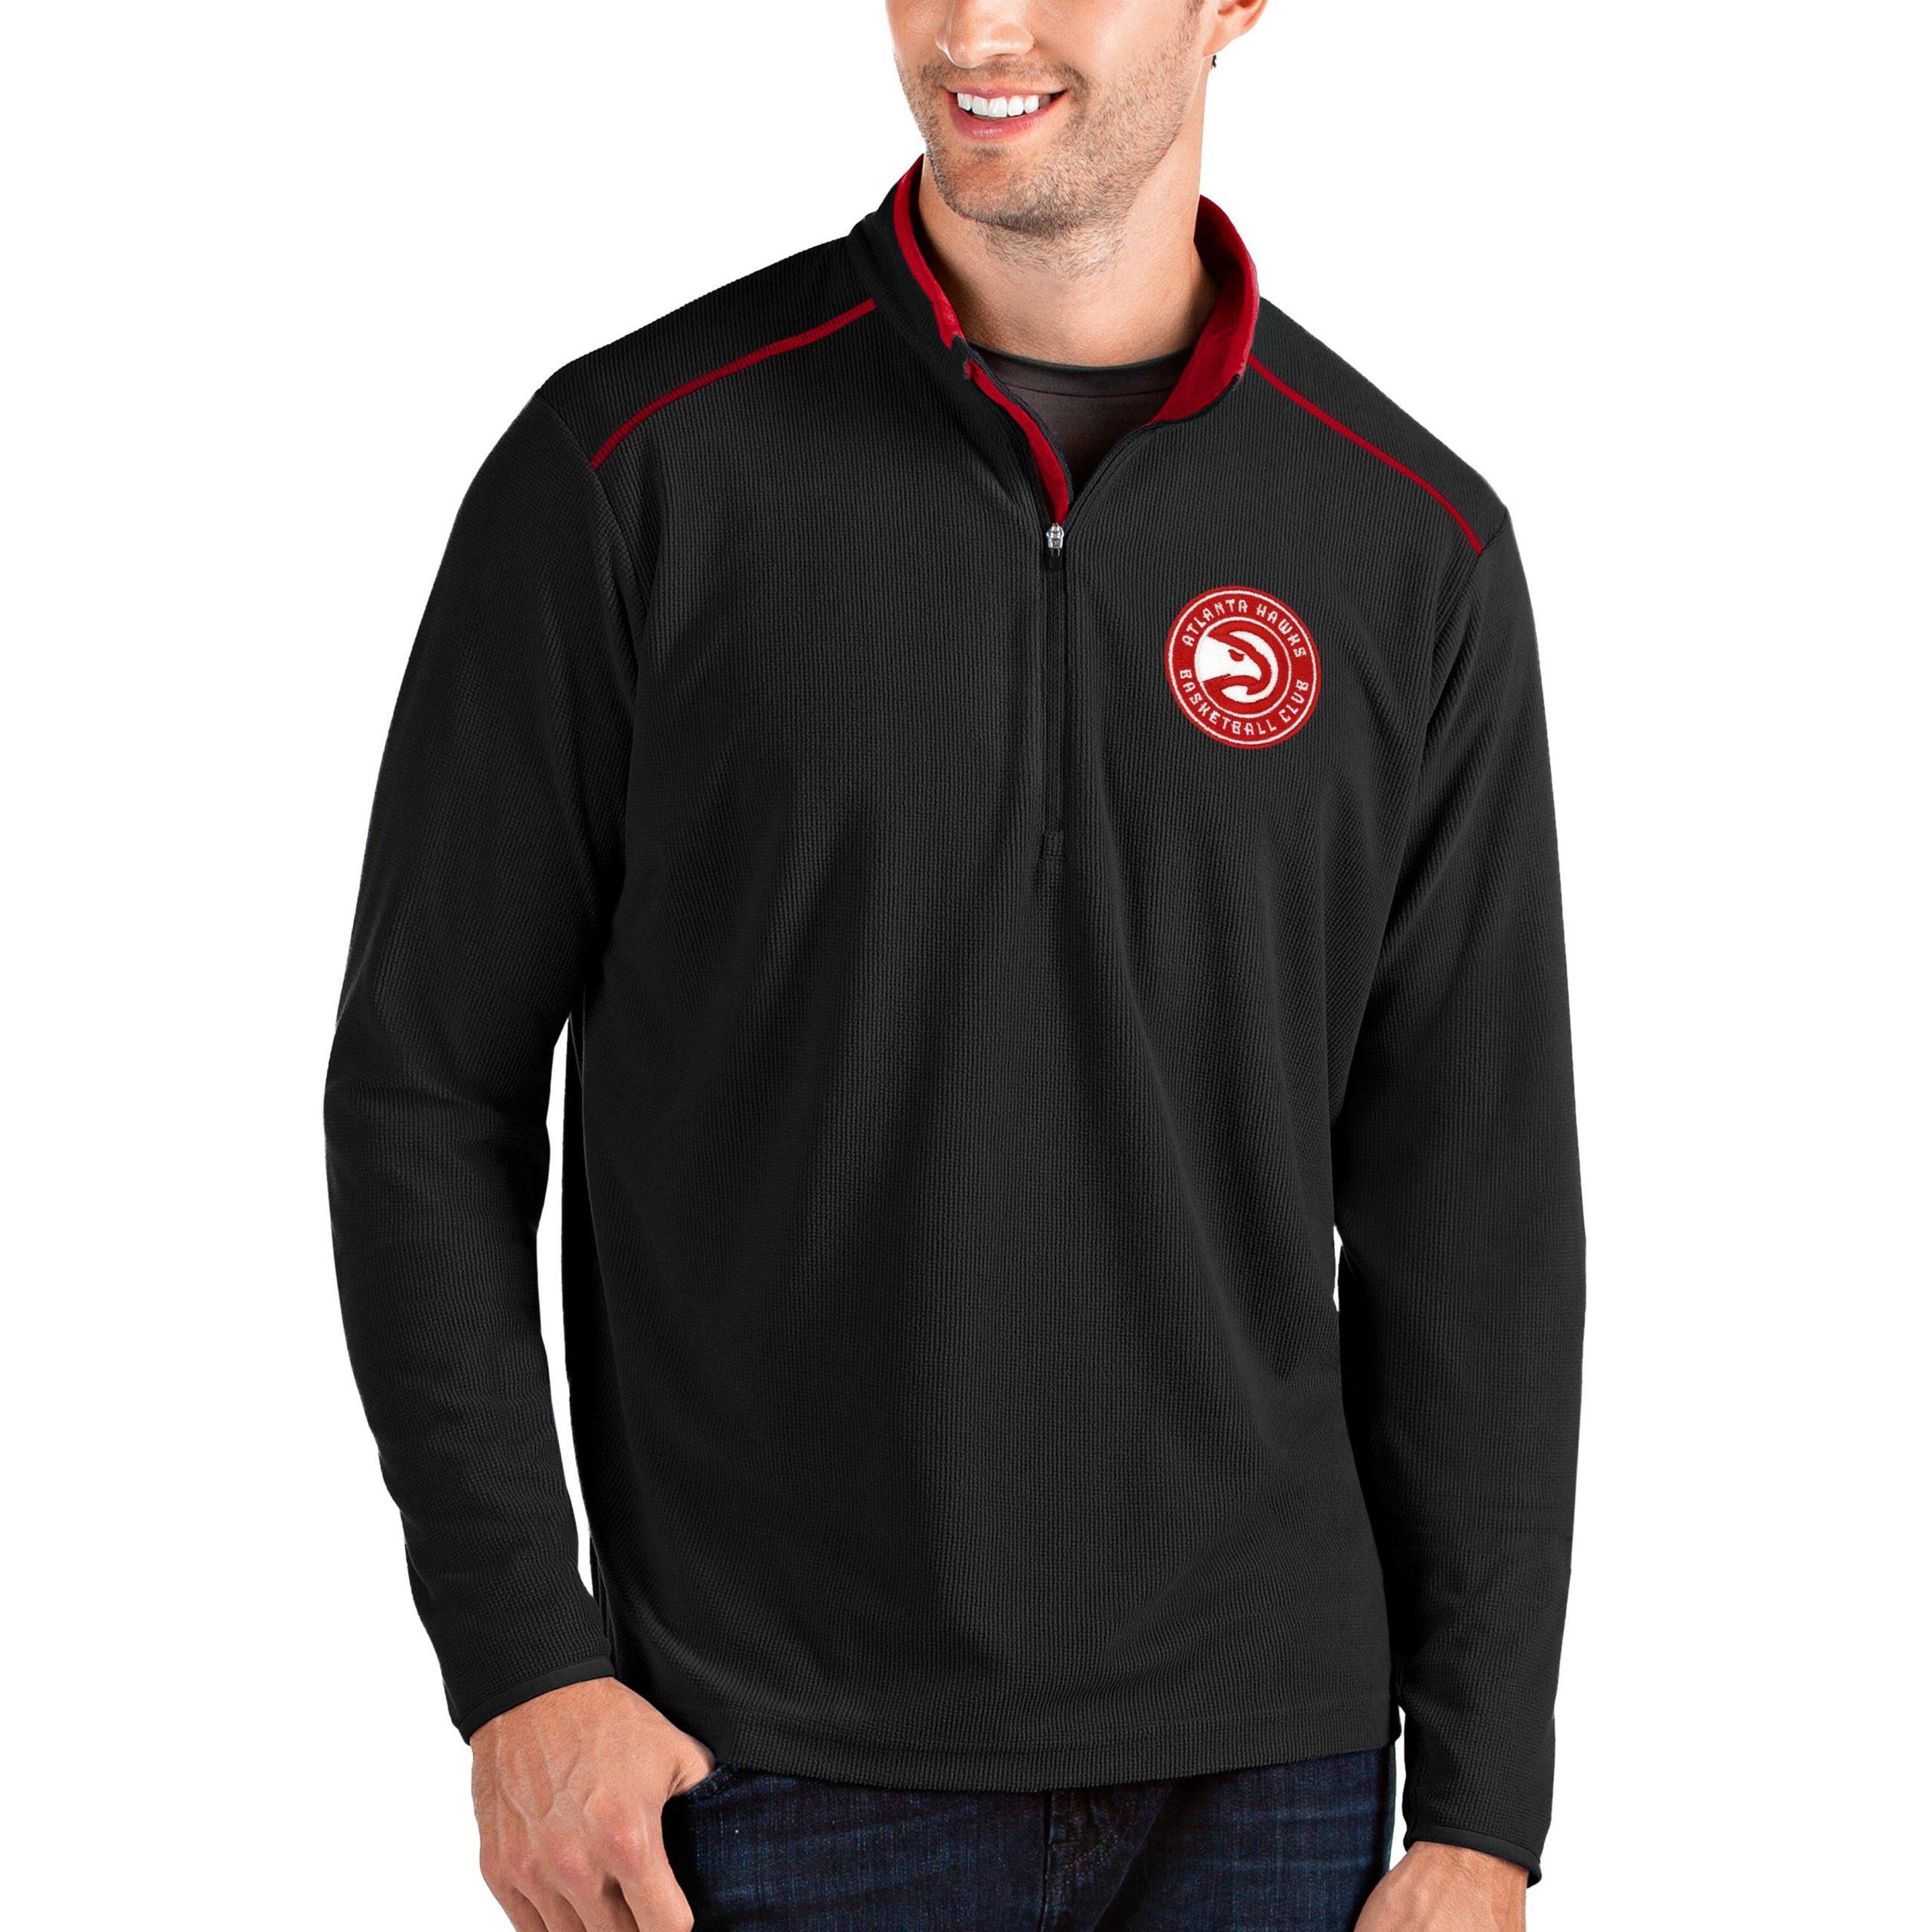 Atlanta Hawks Antigua Big & Tall Glacier Quarter-Zip Pullover Jacket - Black/Red